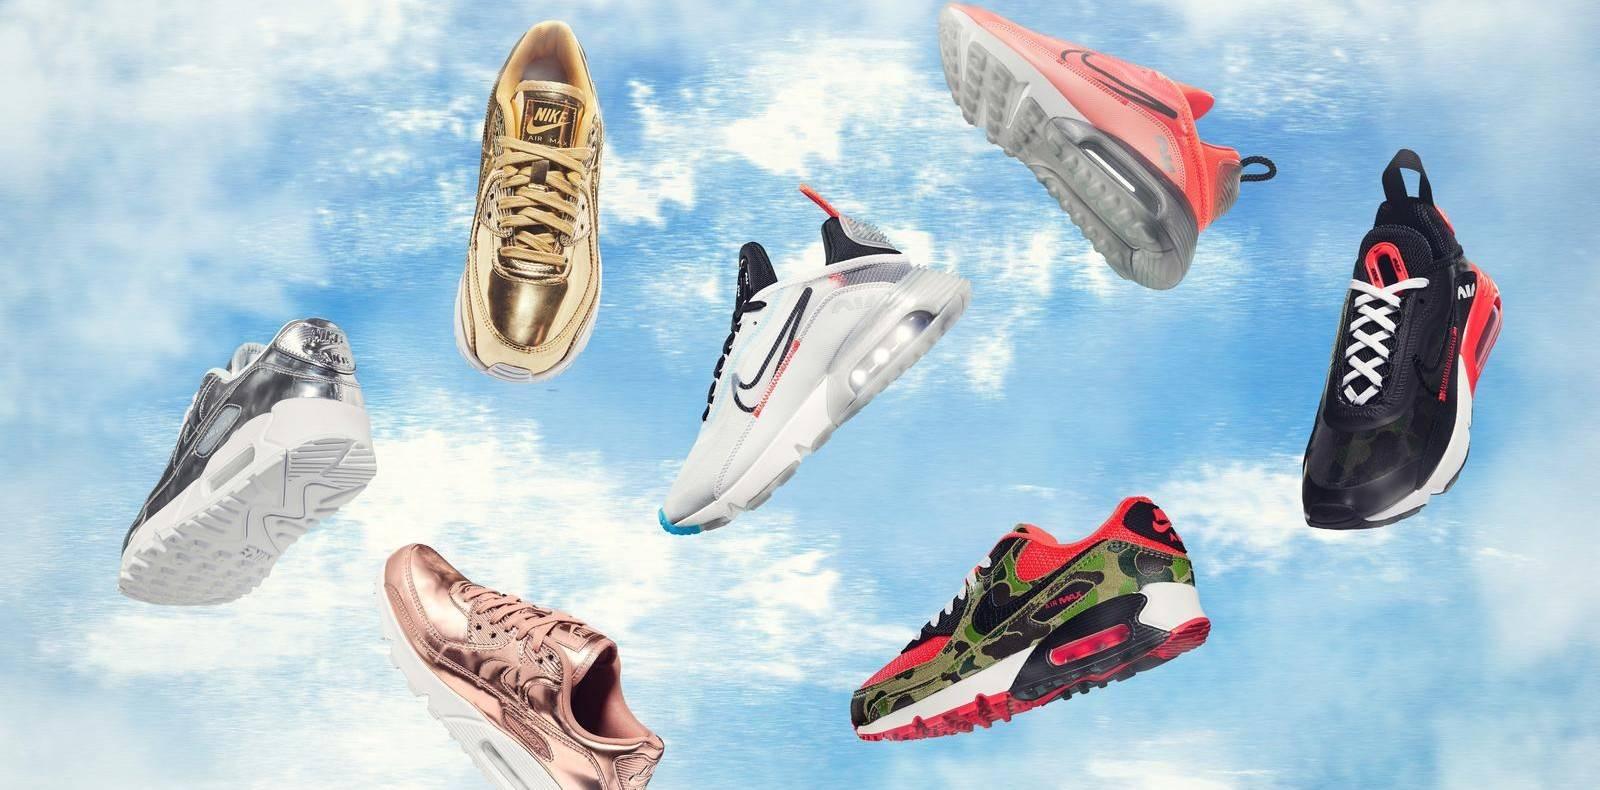 Nike Air Max : la collection 2020